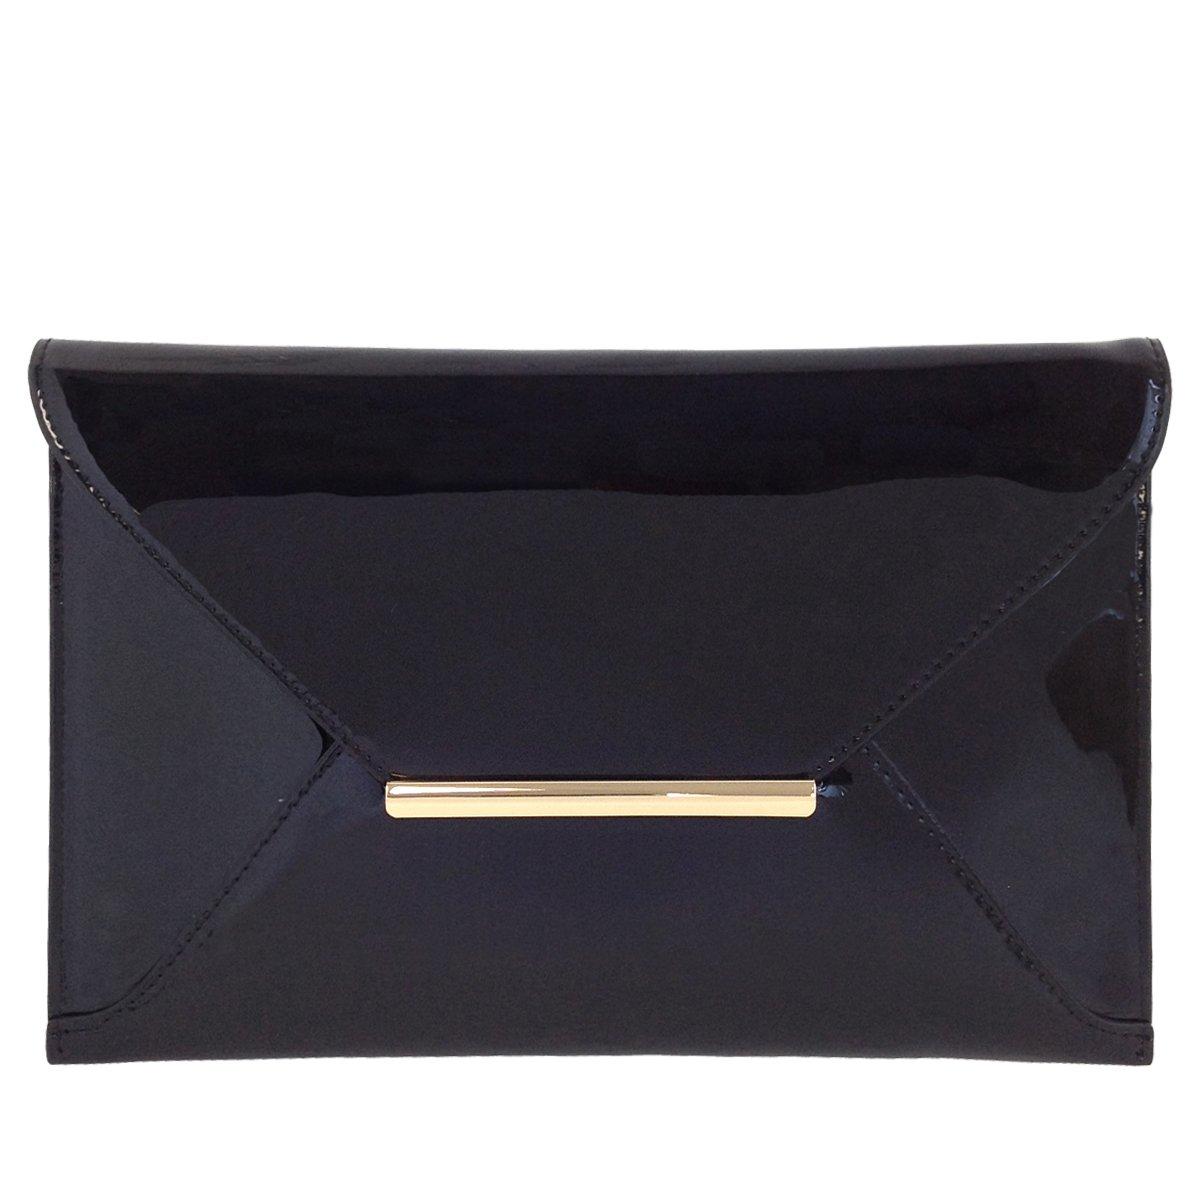 Faux Patent Leather Envelope Candy Clutch Bag, Black